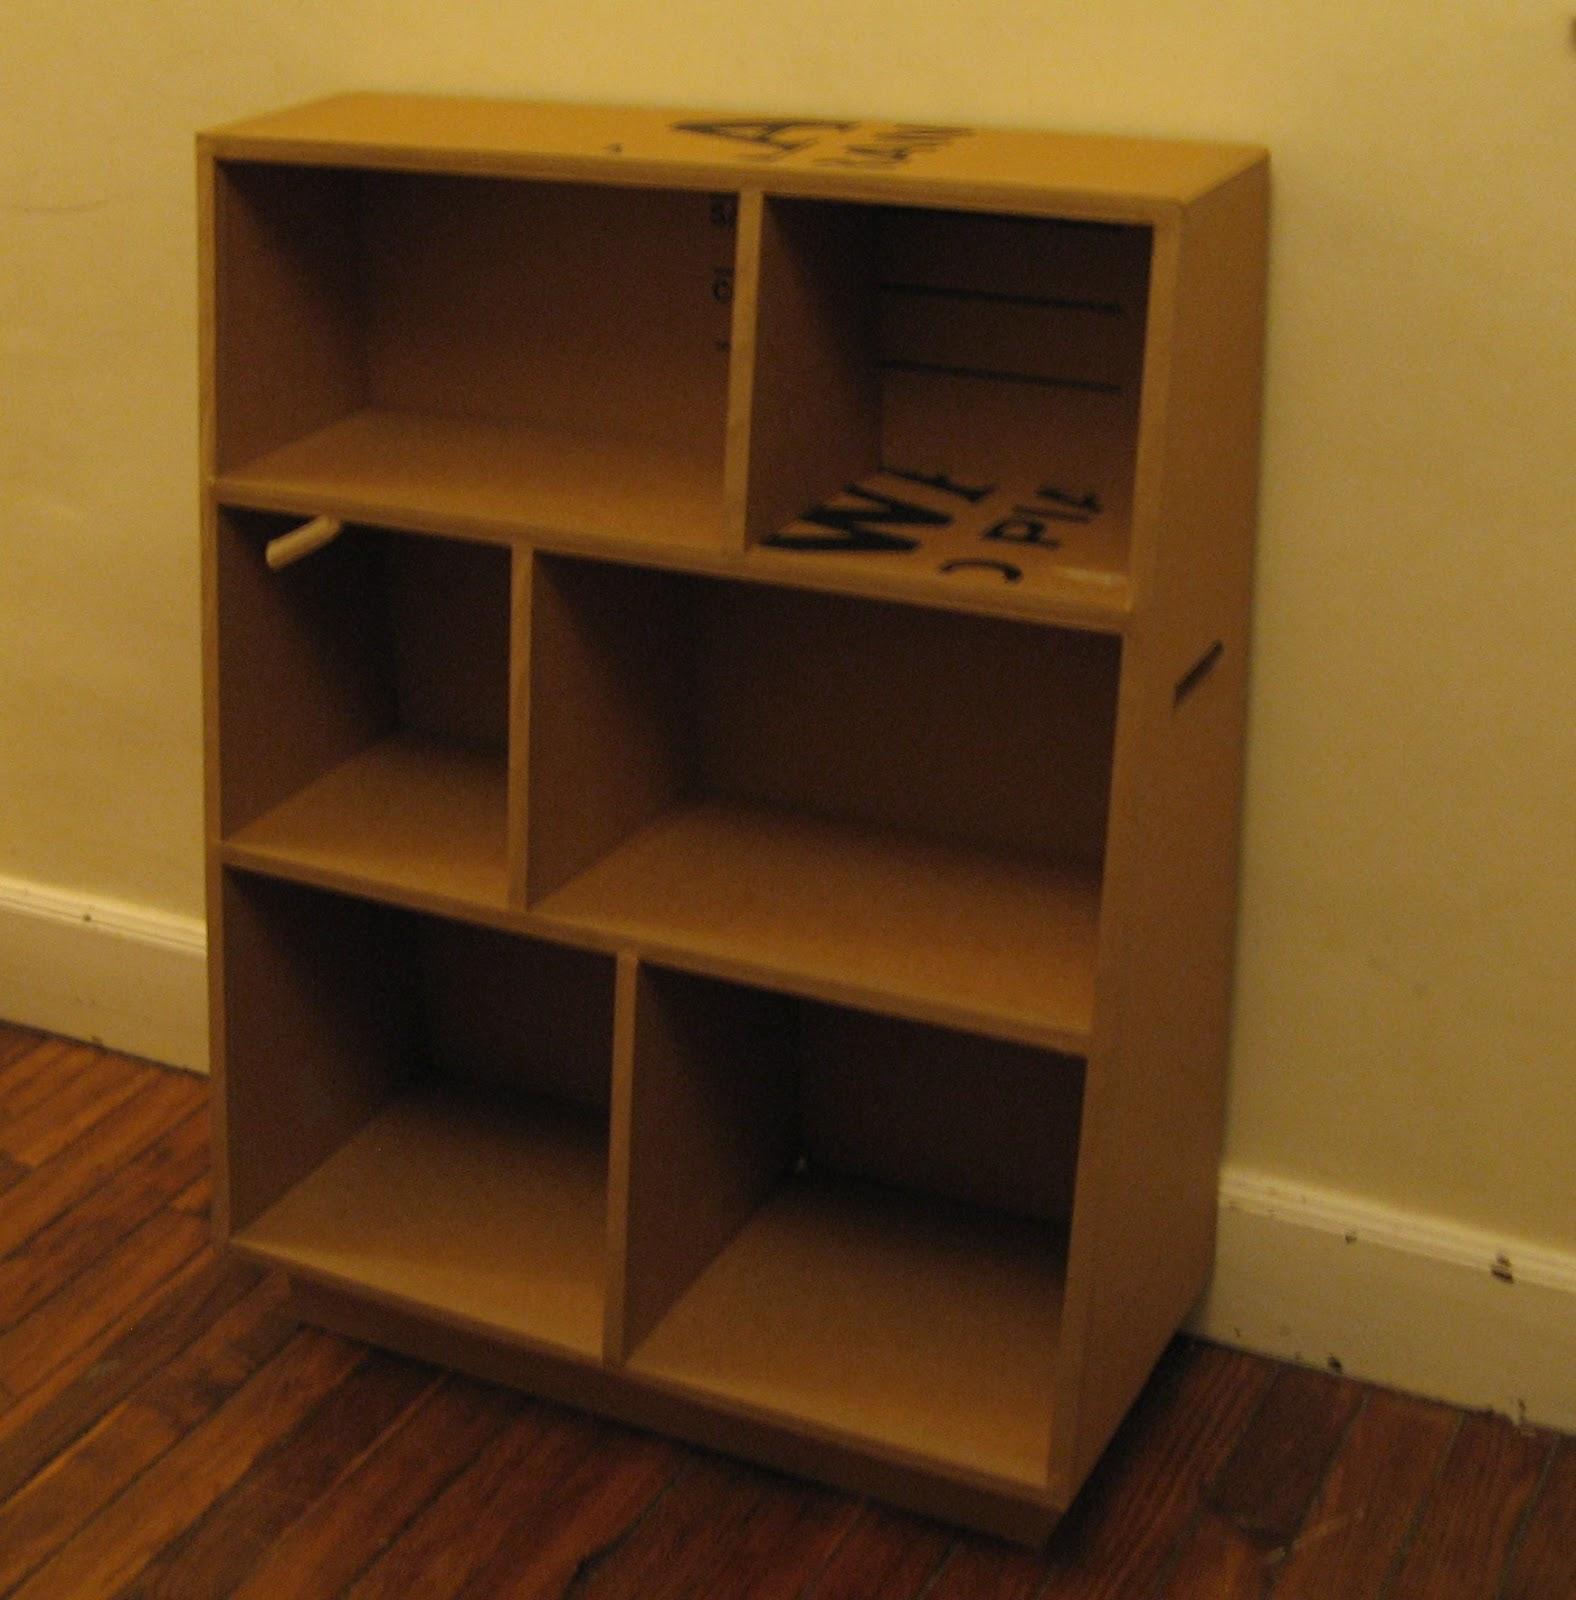 petite biblioth que carton. Black Bedroom Furniture Sets. Home Design Ideas